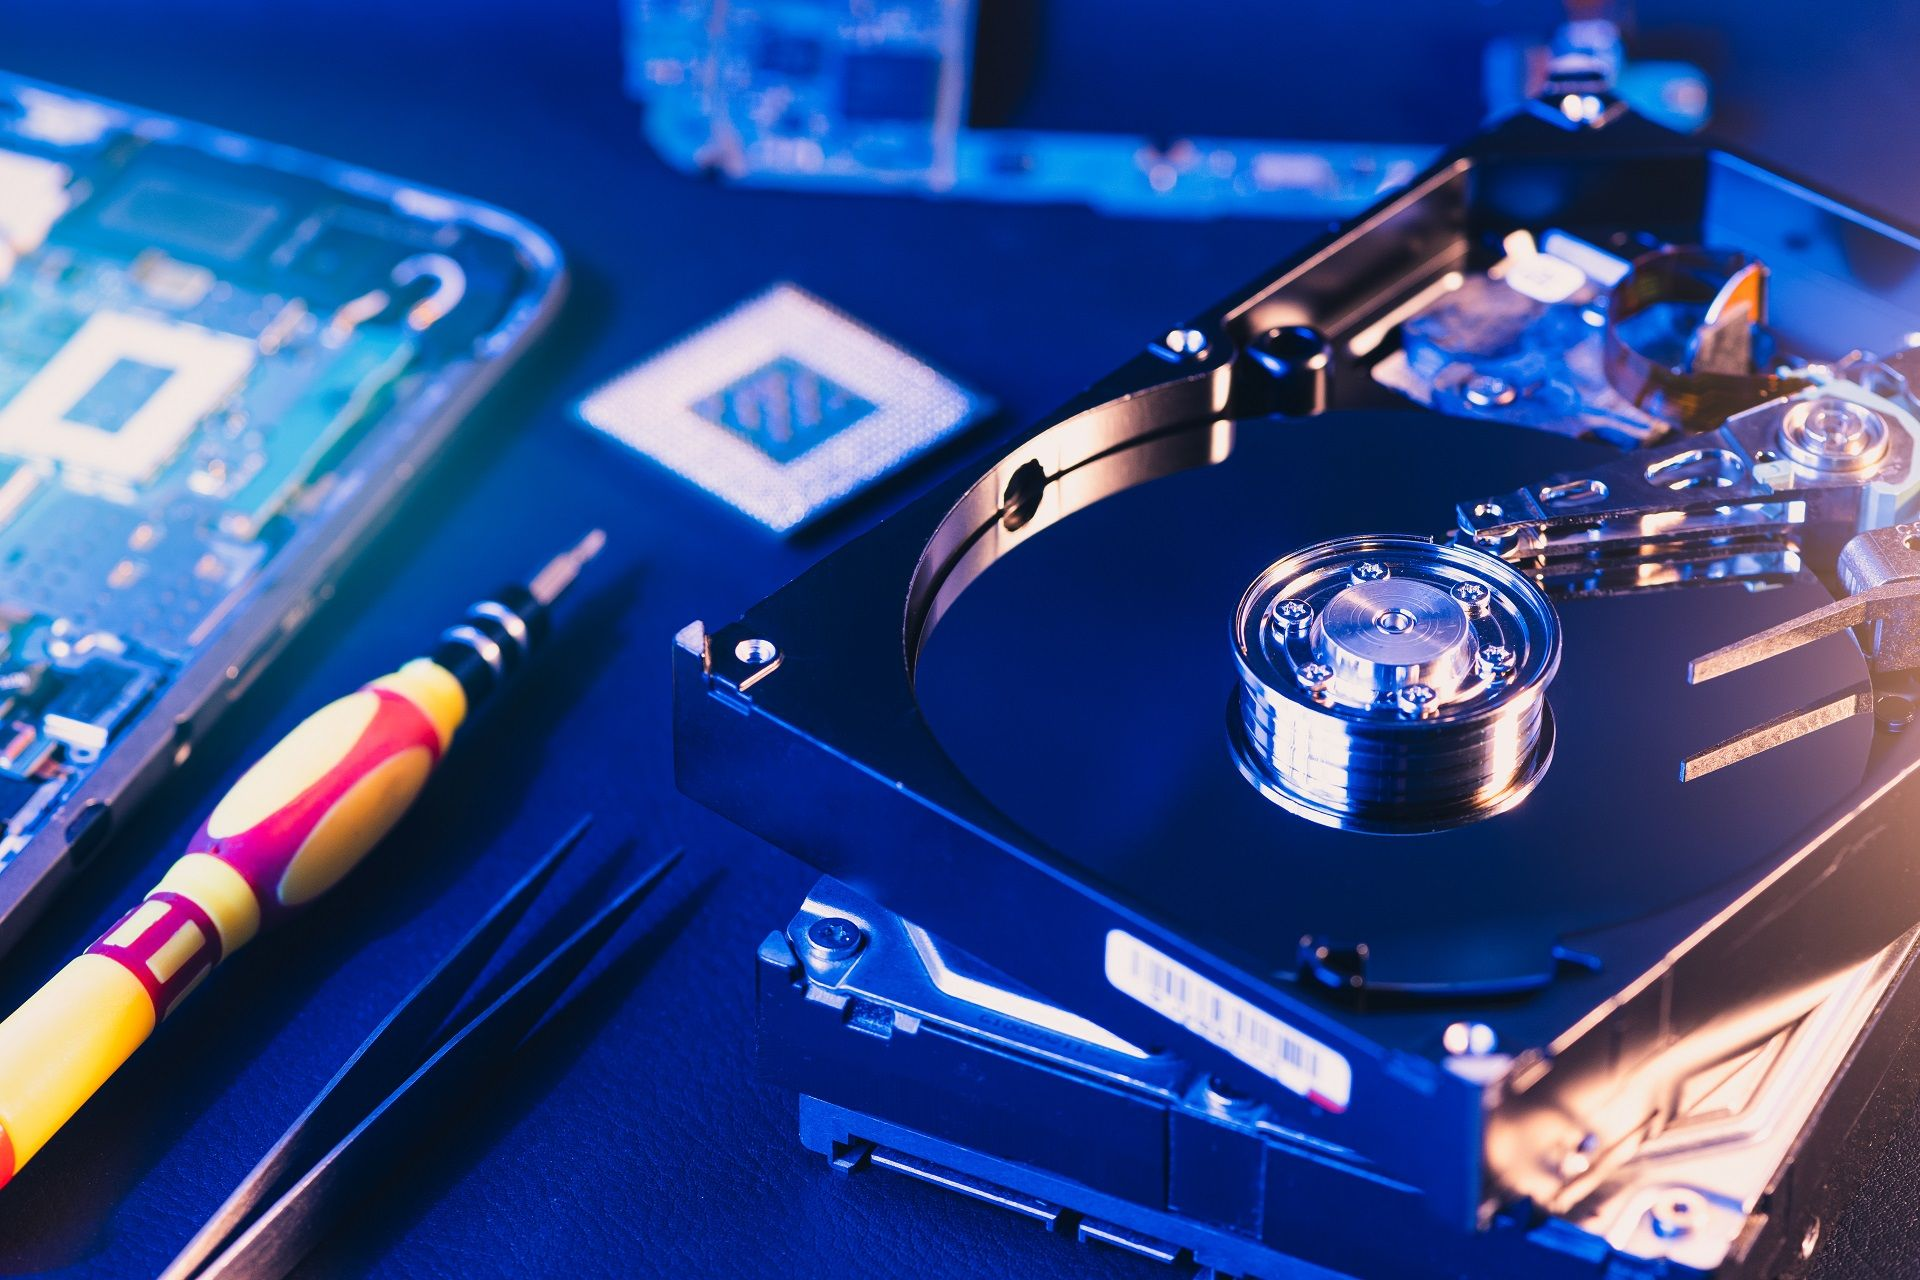 How To Fix Invalid Partition Table Usb Boot Error Usb Fix It Flash Drive